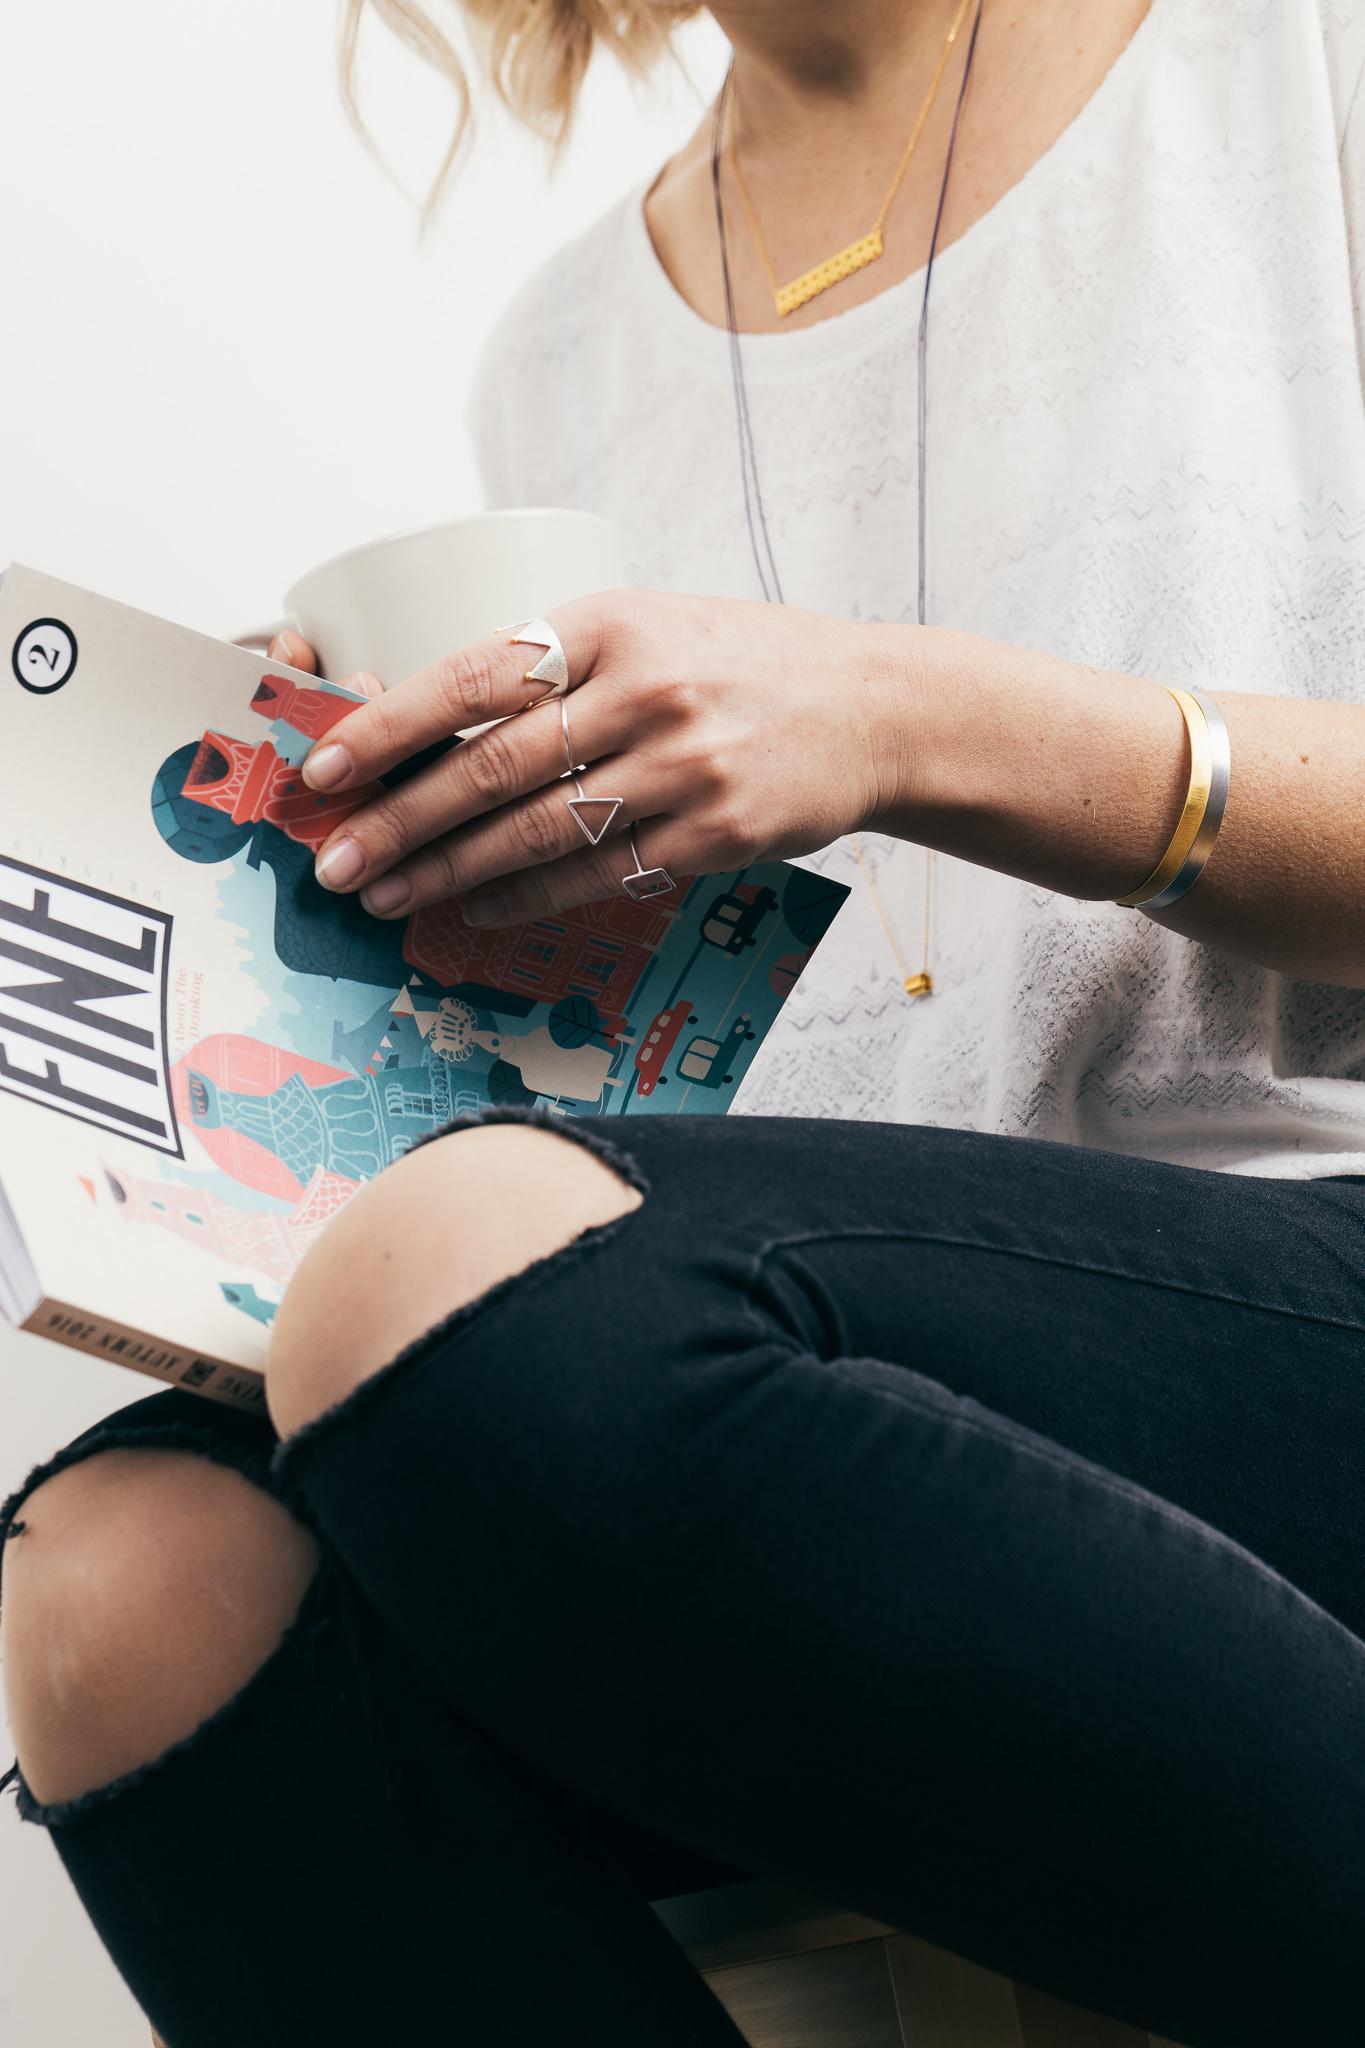 kostis sohoritis photography fashion Prigipo lookbook 14.jpg